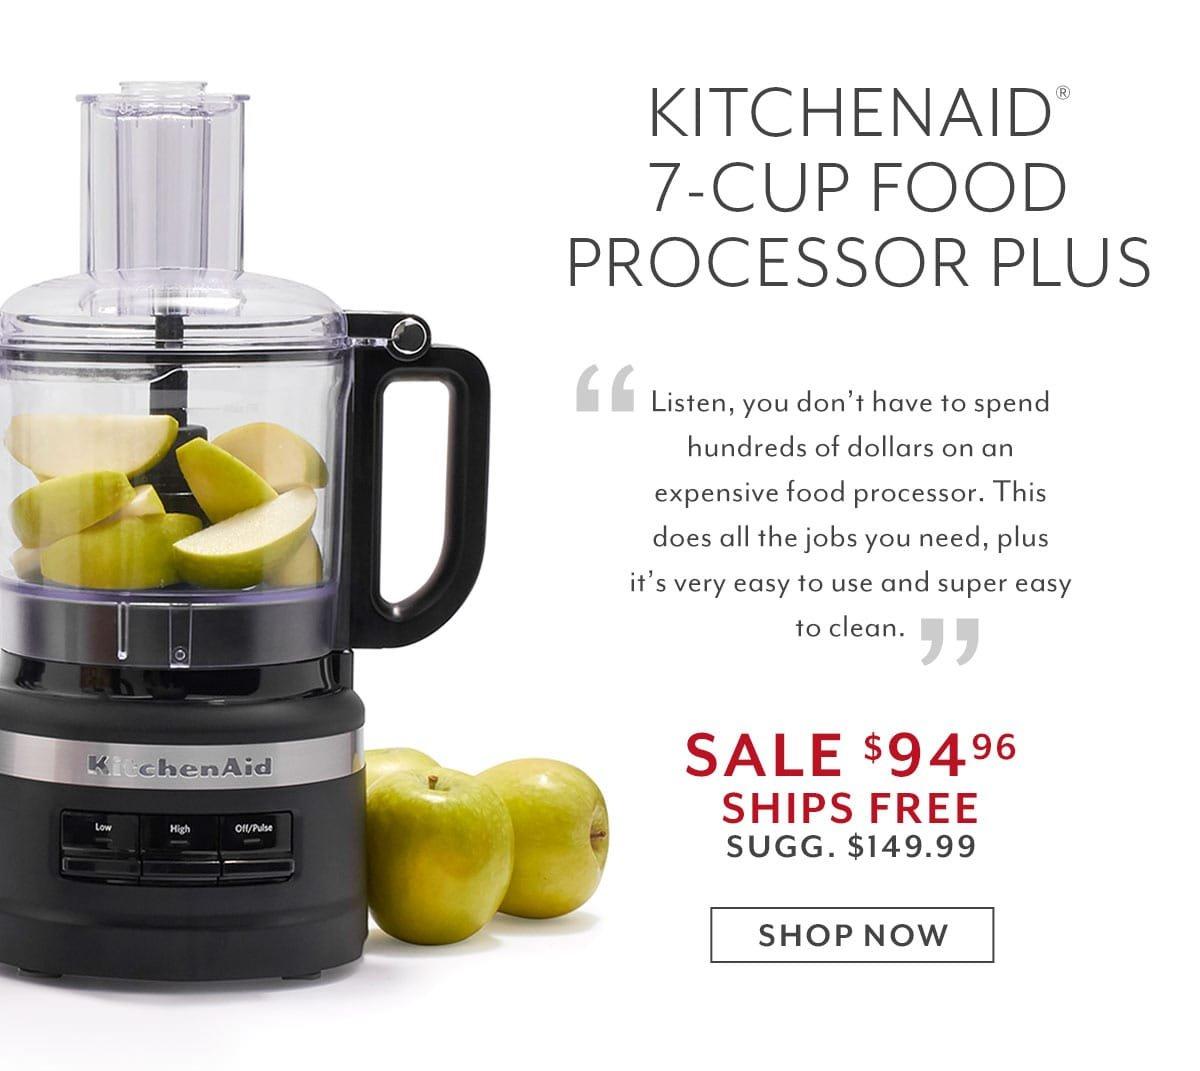 KitchenAid 7 Cup Food Processor Plus